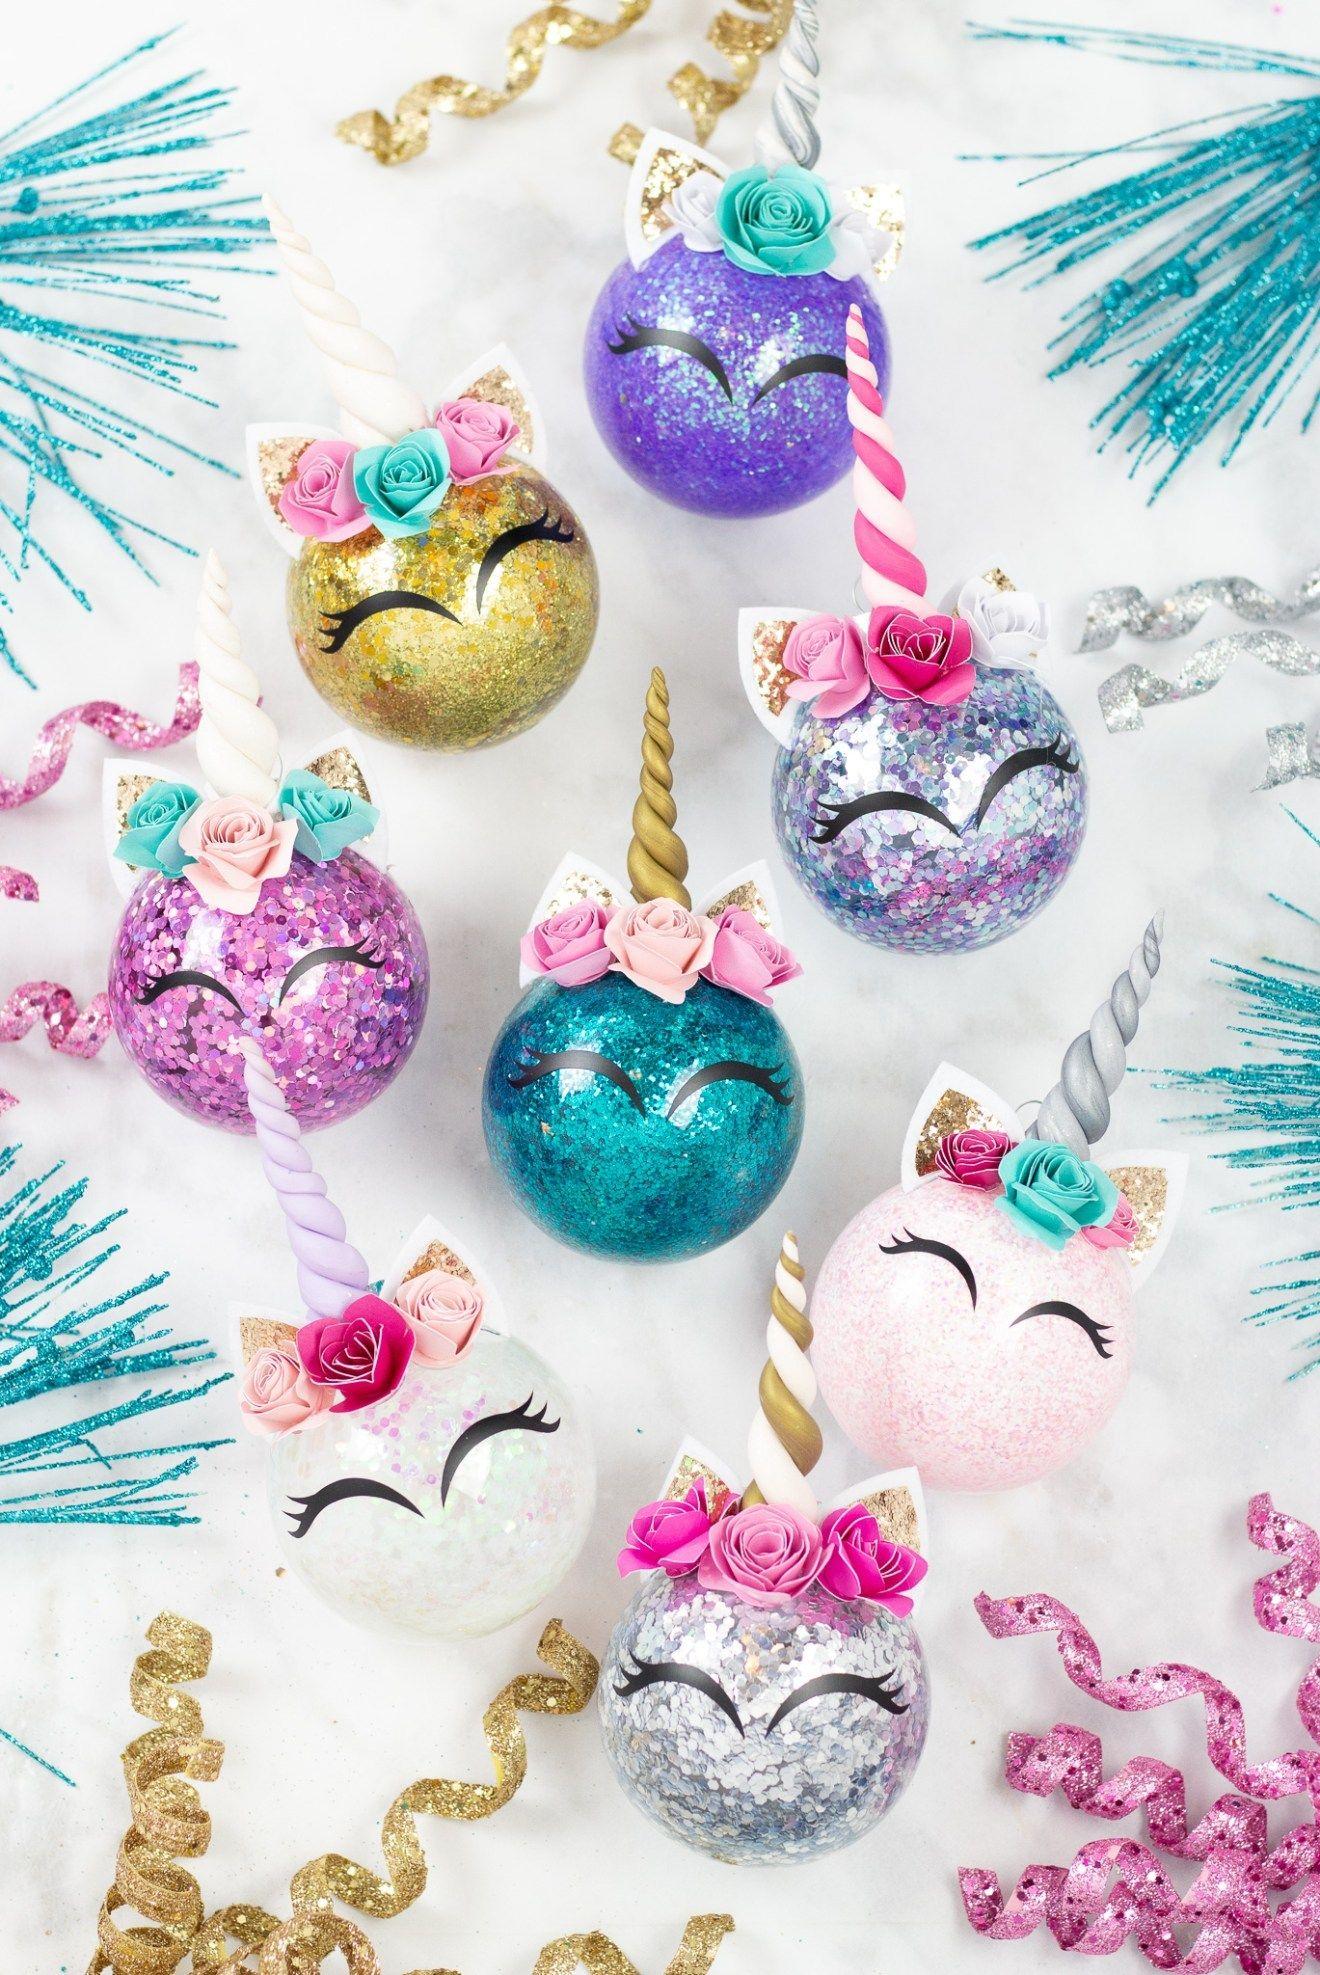 25 Cricut Christmas Ornaments To Diy Christmas Ornaments Diy Christmas Ornaments Easy Handmade Christmas Ornaments